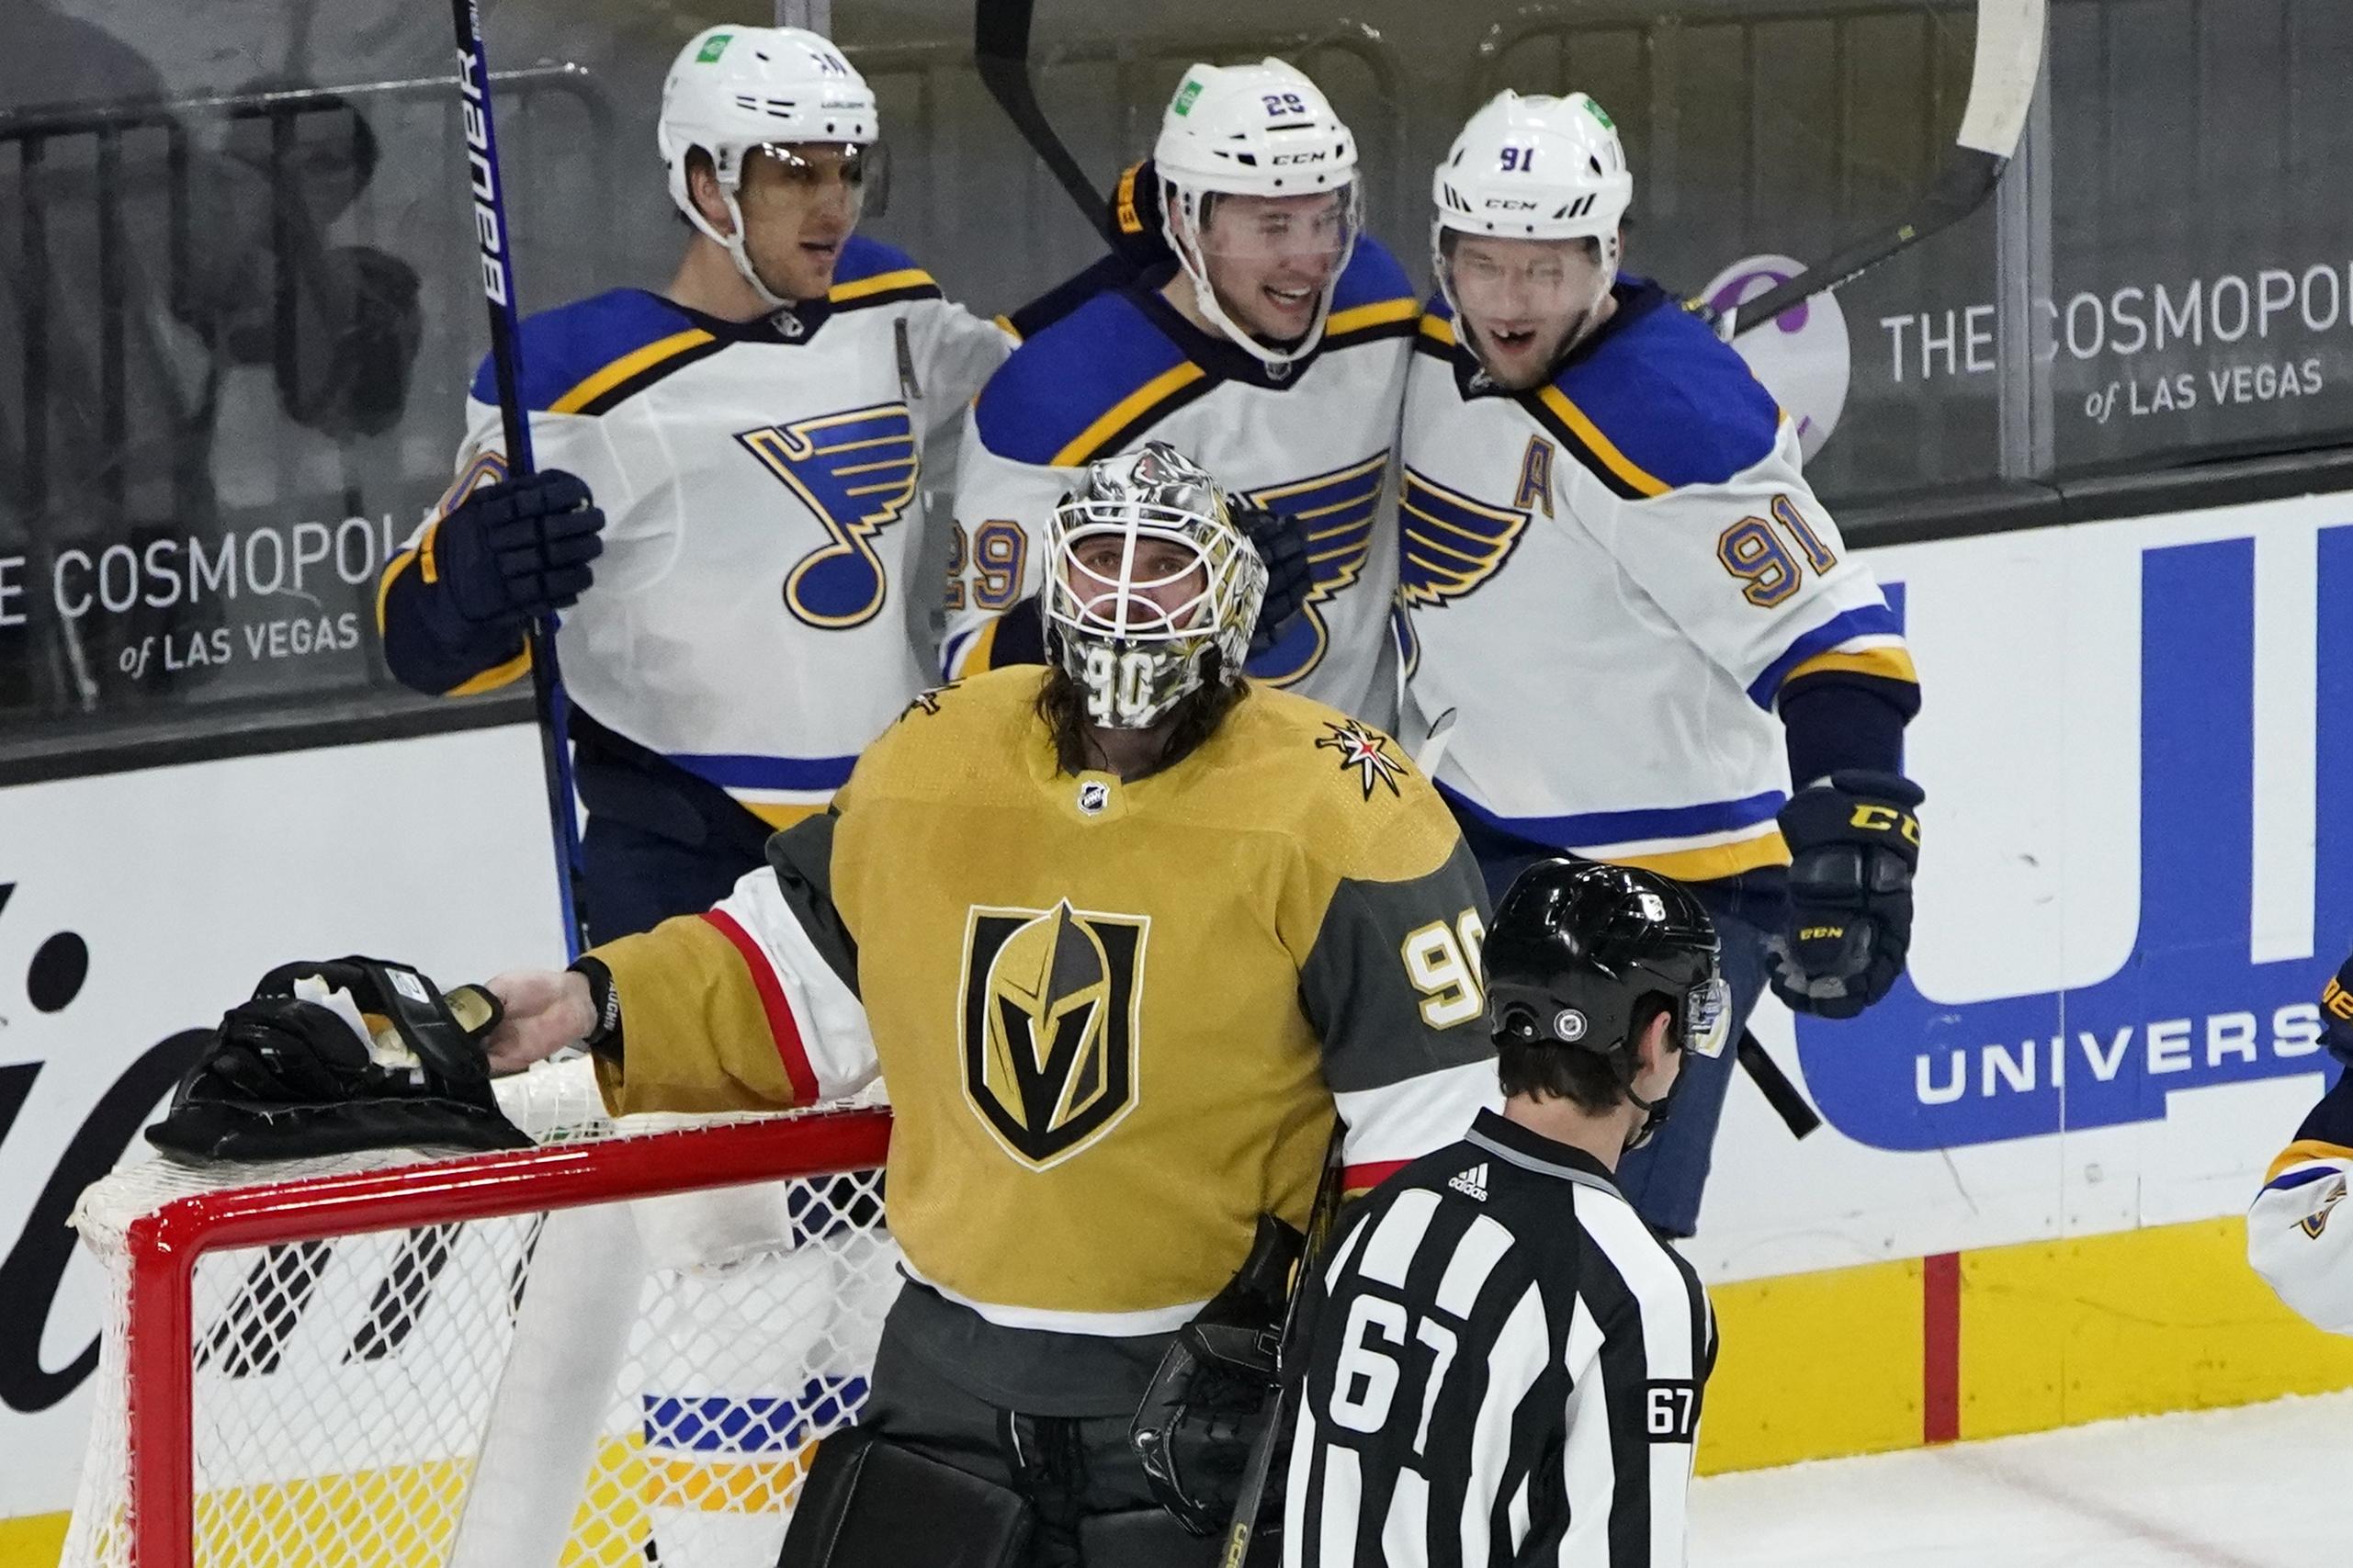 NHL: St. Louis Blues at Vegas